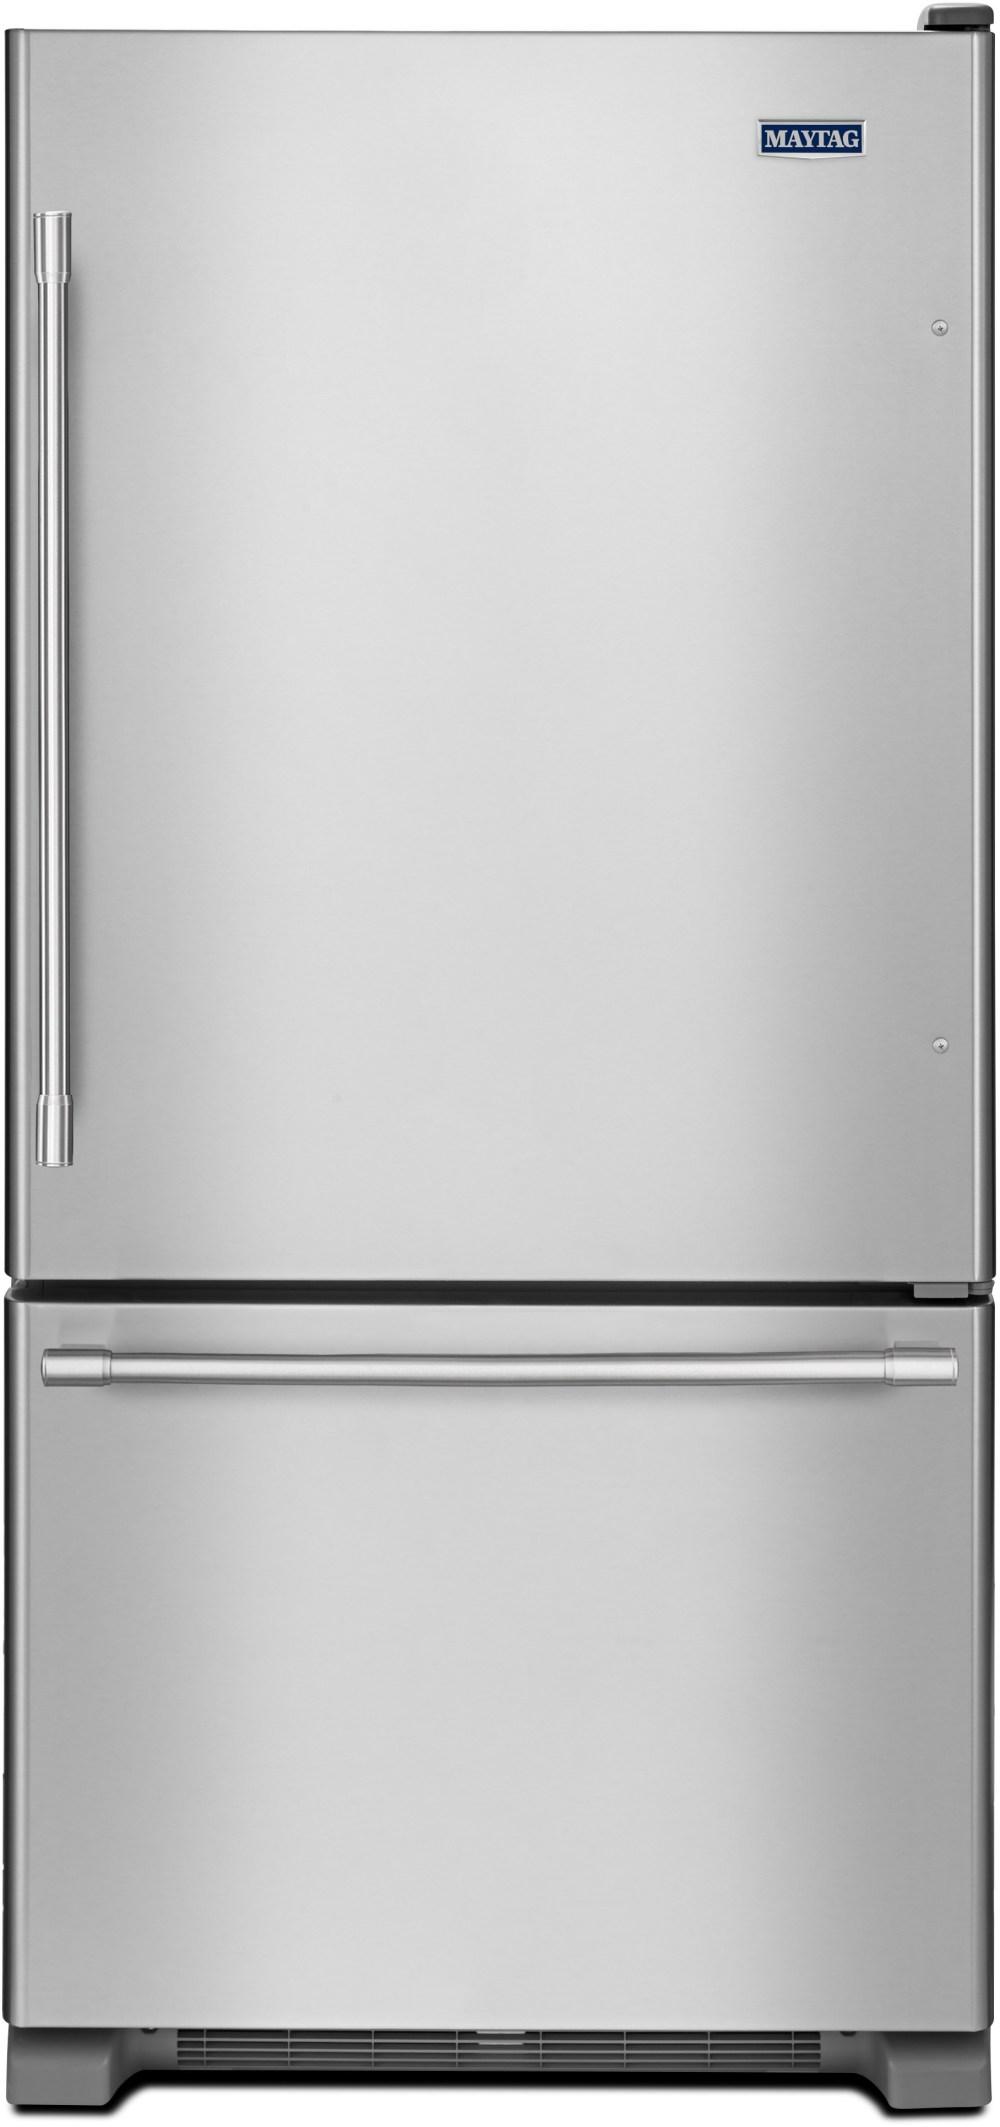 medium resolution of height 67 67 9 refrigerators ge furnace wire diagram wire diagram for ge refrigerator 22 25